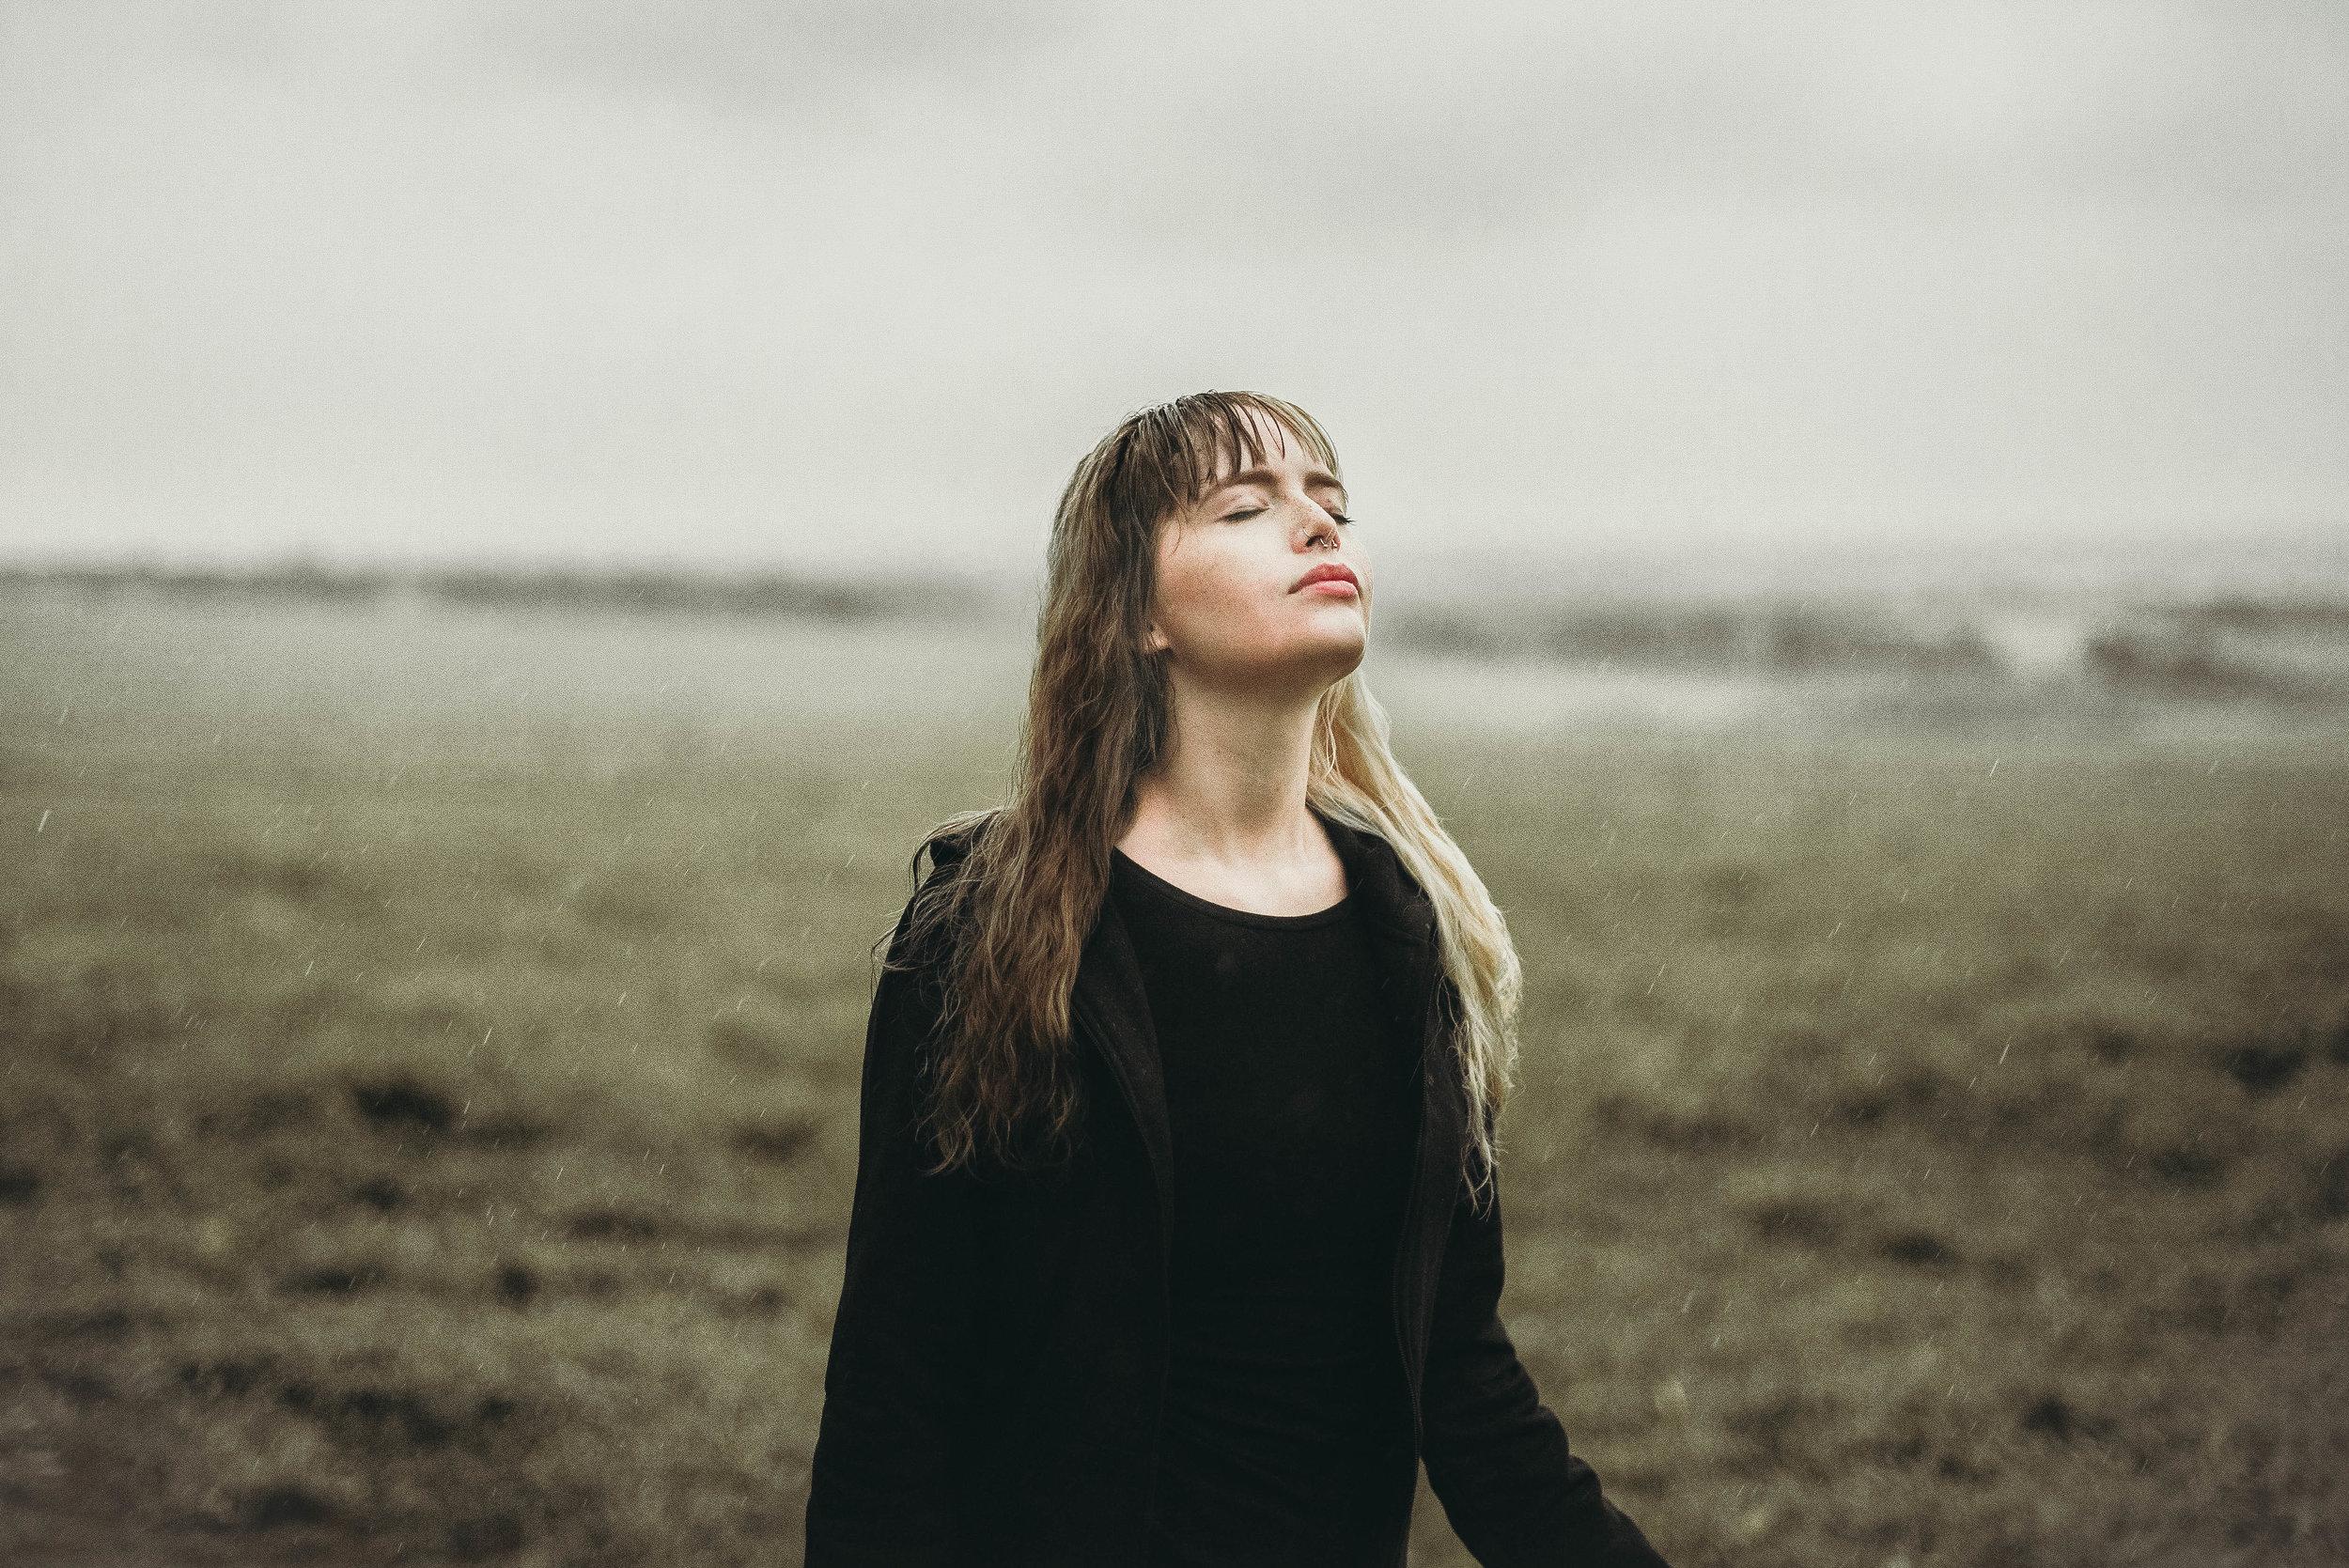 Woman+in+Rain-worship-portland-oregon-healing-freedom-from-sexual-addition.jpg